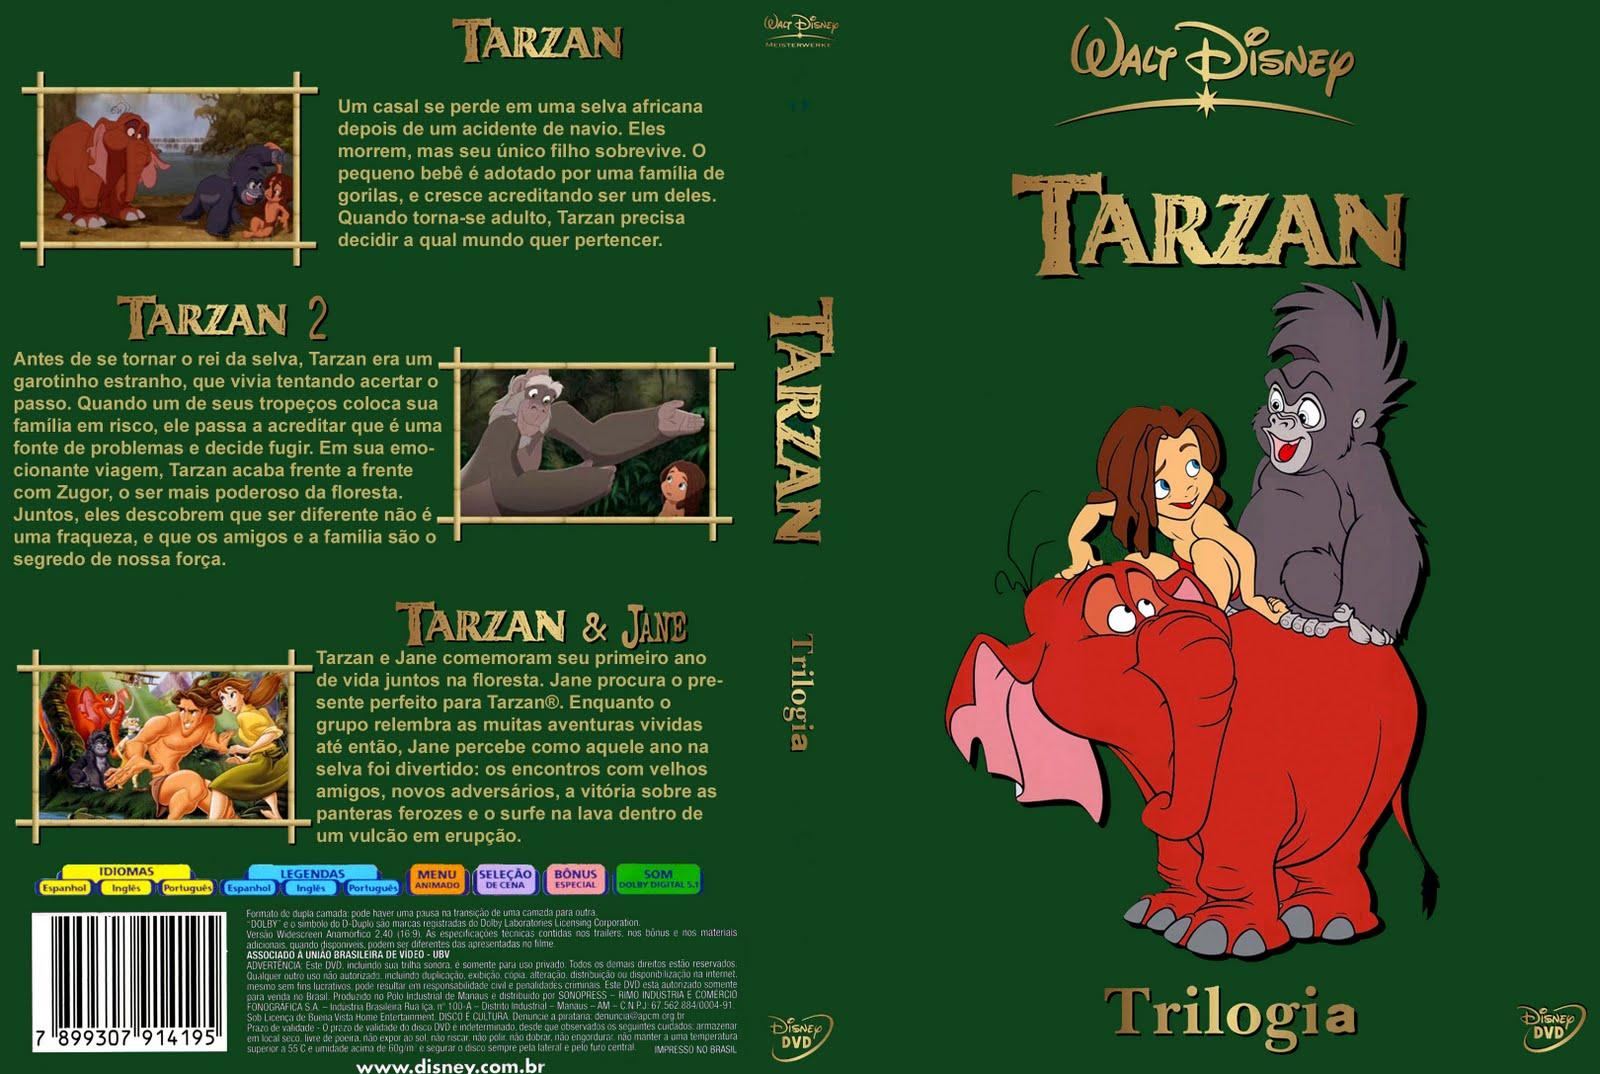 Tarzan 2 Dvd Tarzan 2 Dvd Menu Source